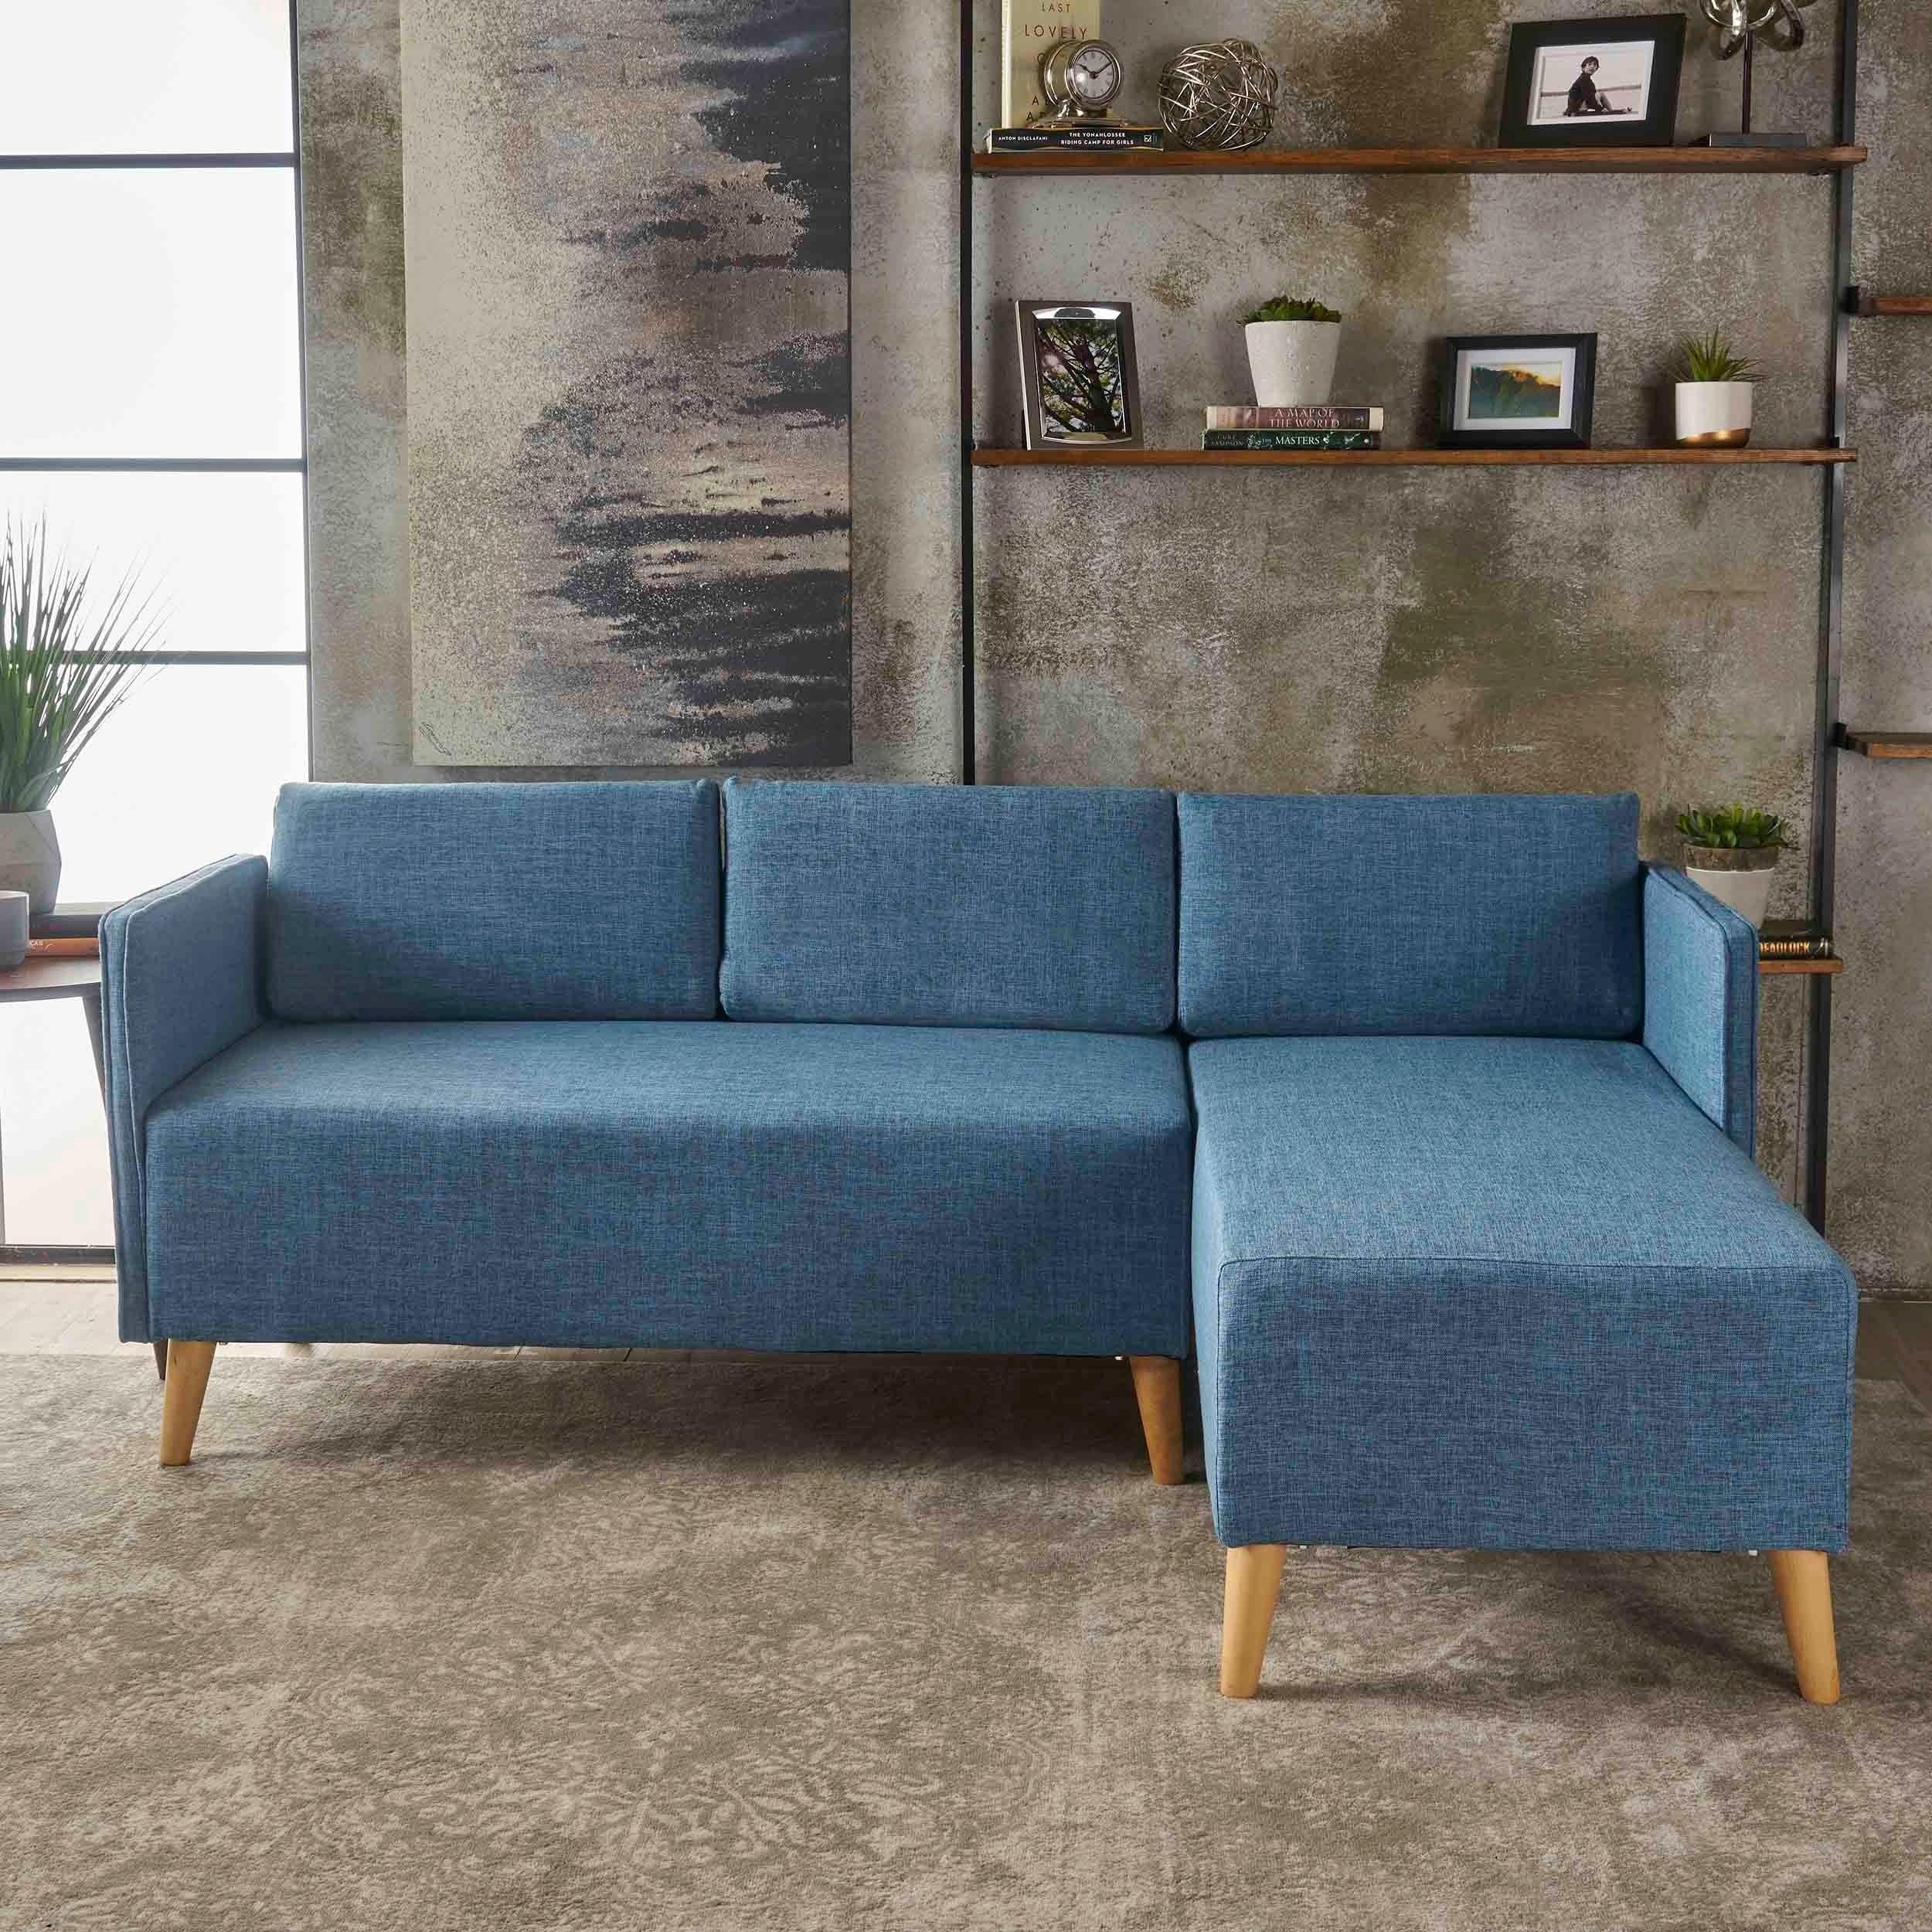 Awesome Couch Cast Adornment - Bathroom and Shower Ideas - purosion.com